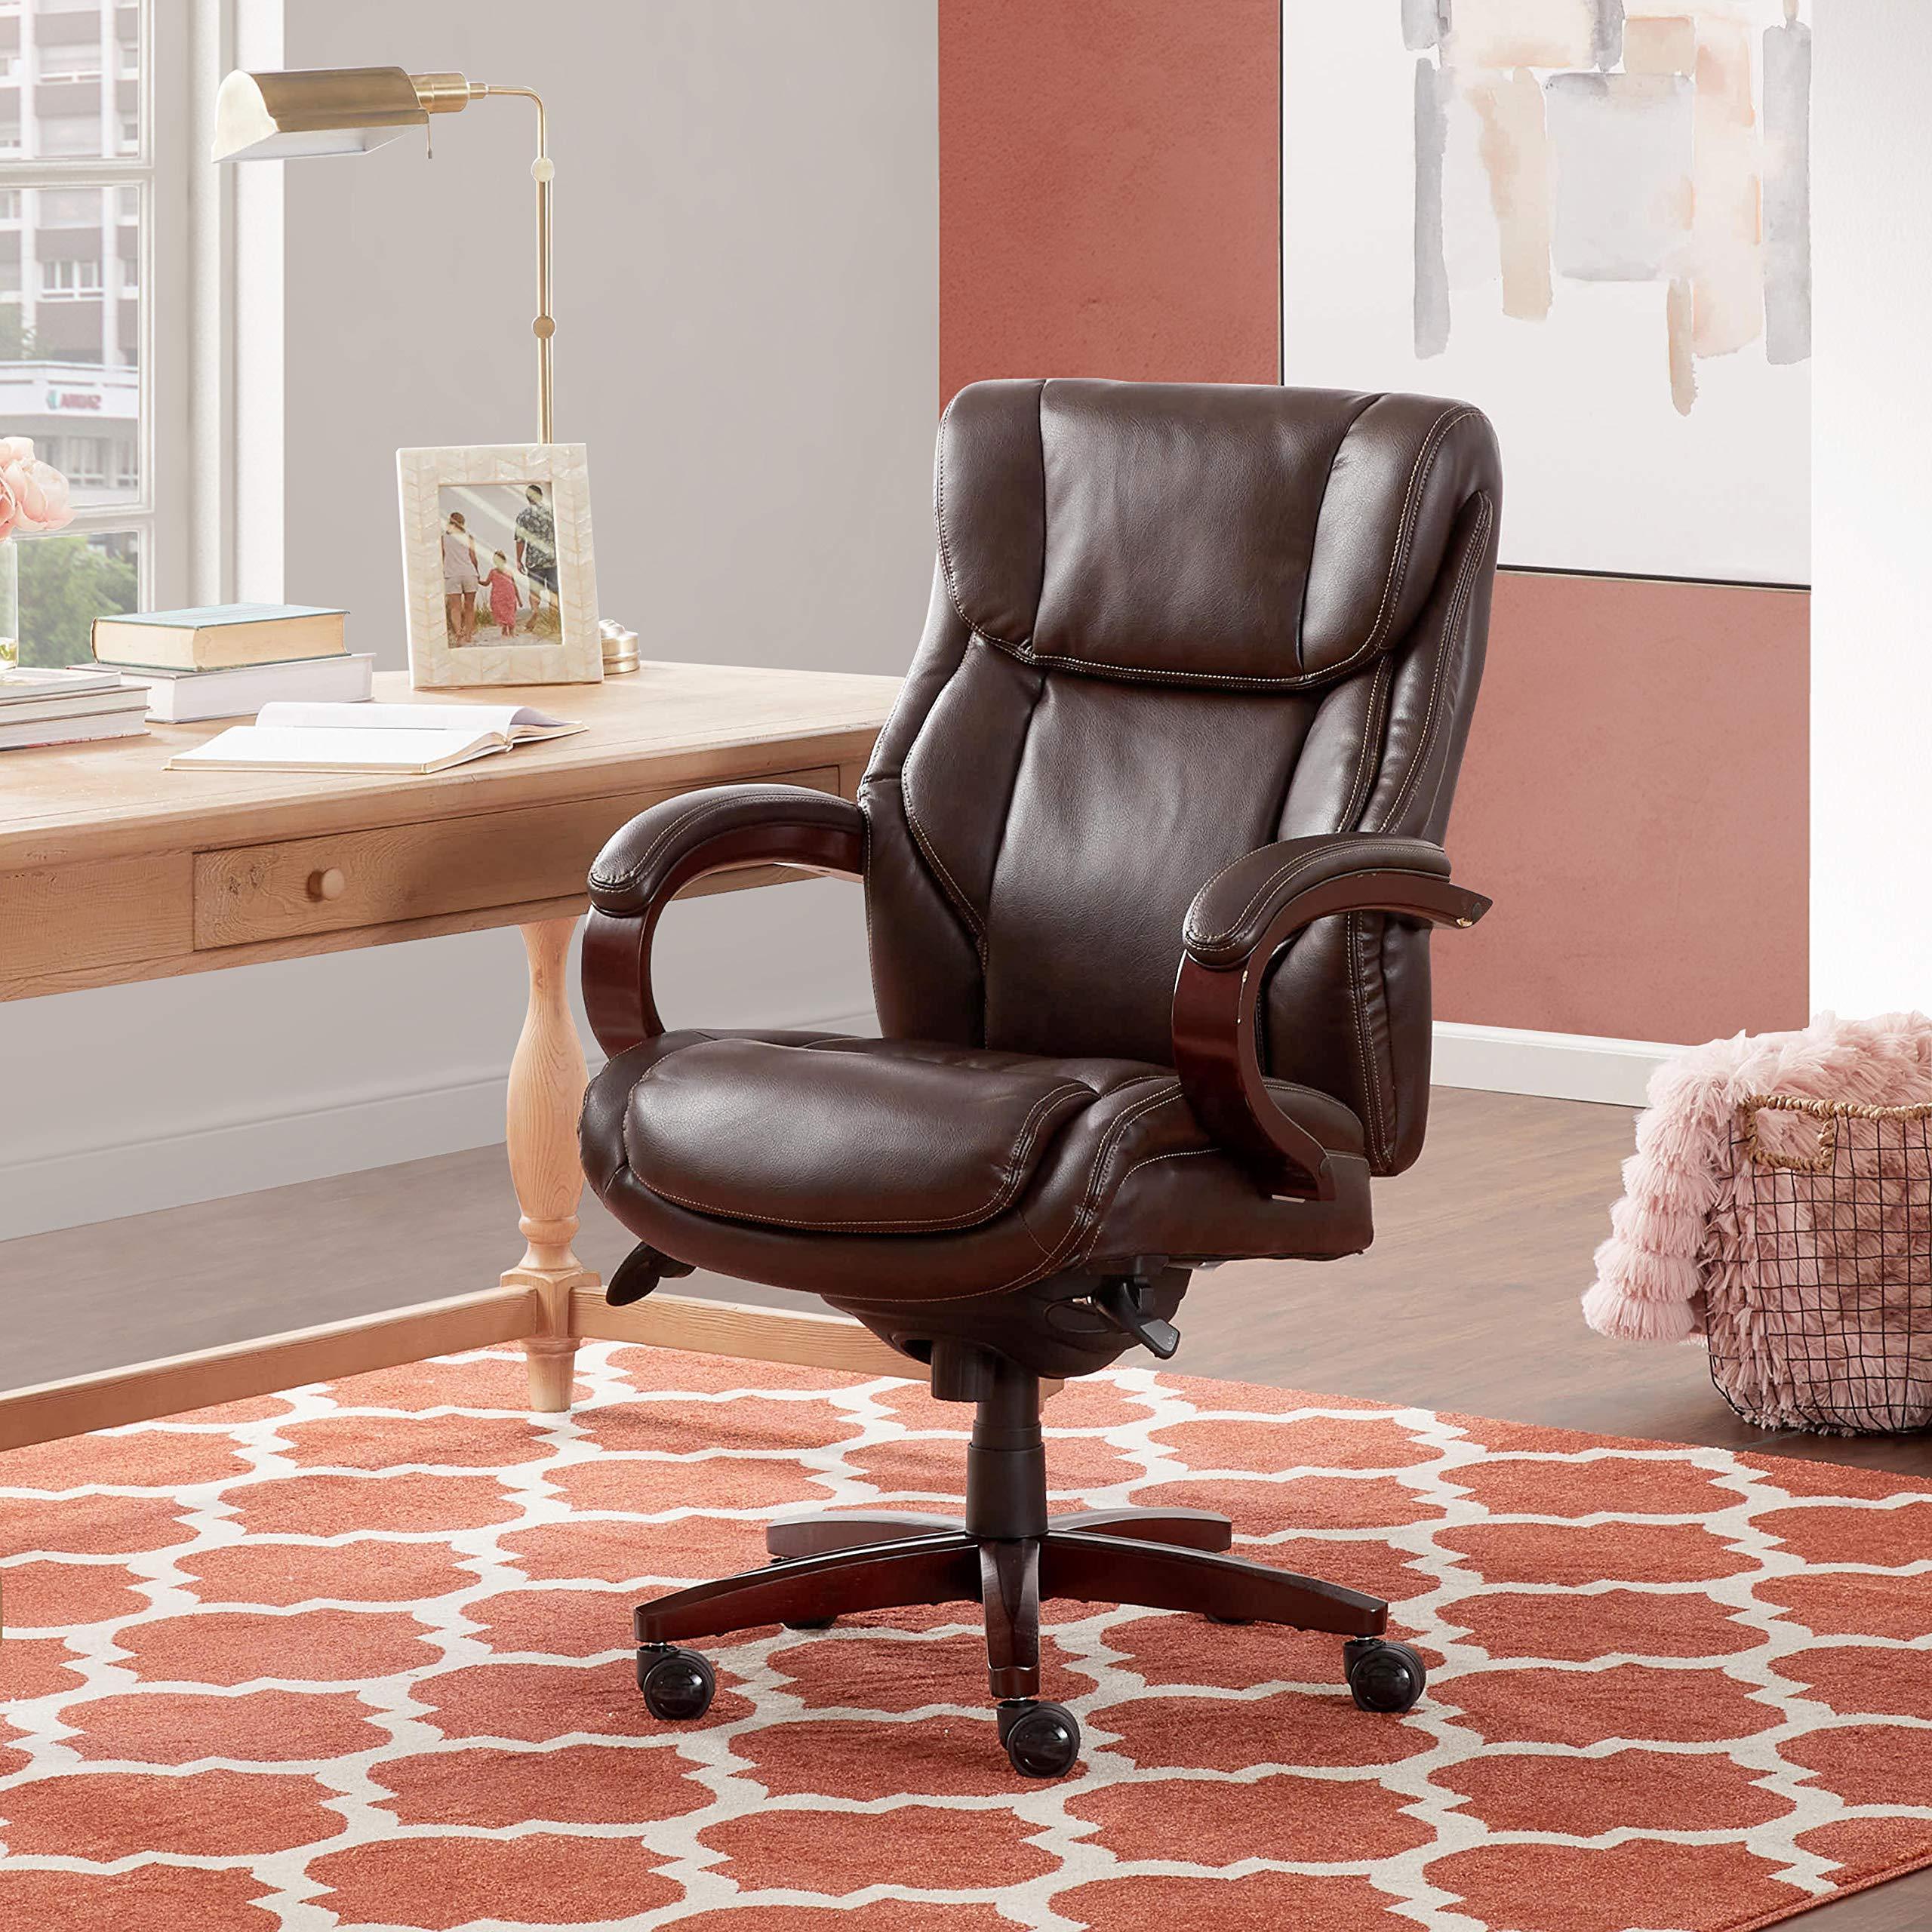 La-Z-Boy Bellamy Executive Bonded Leather Office Chair - Coffee (Brown) by La-Z-Boy